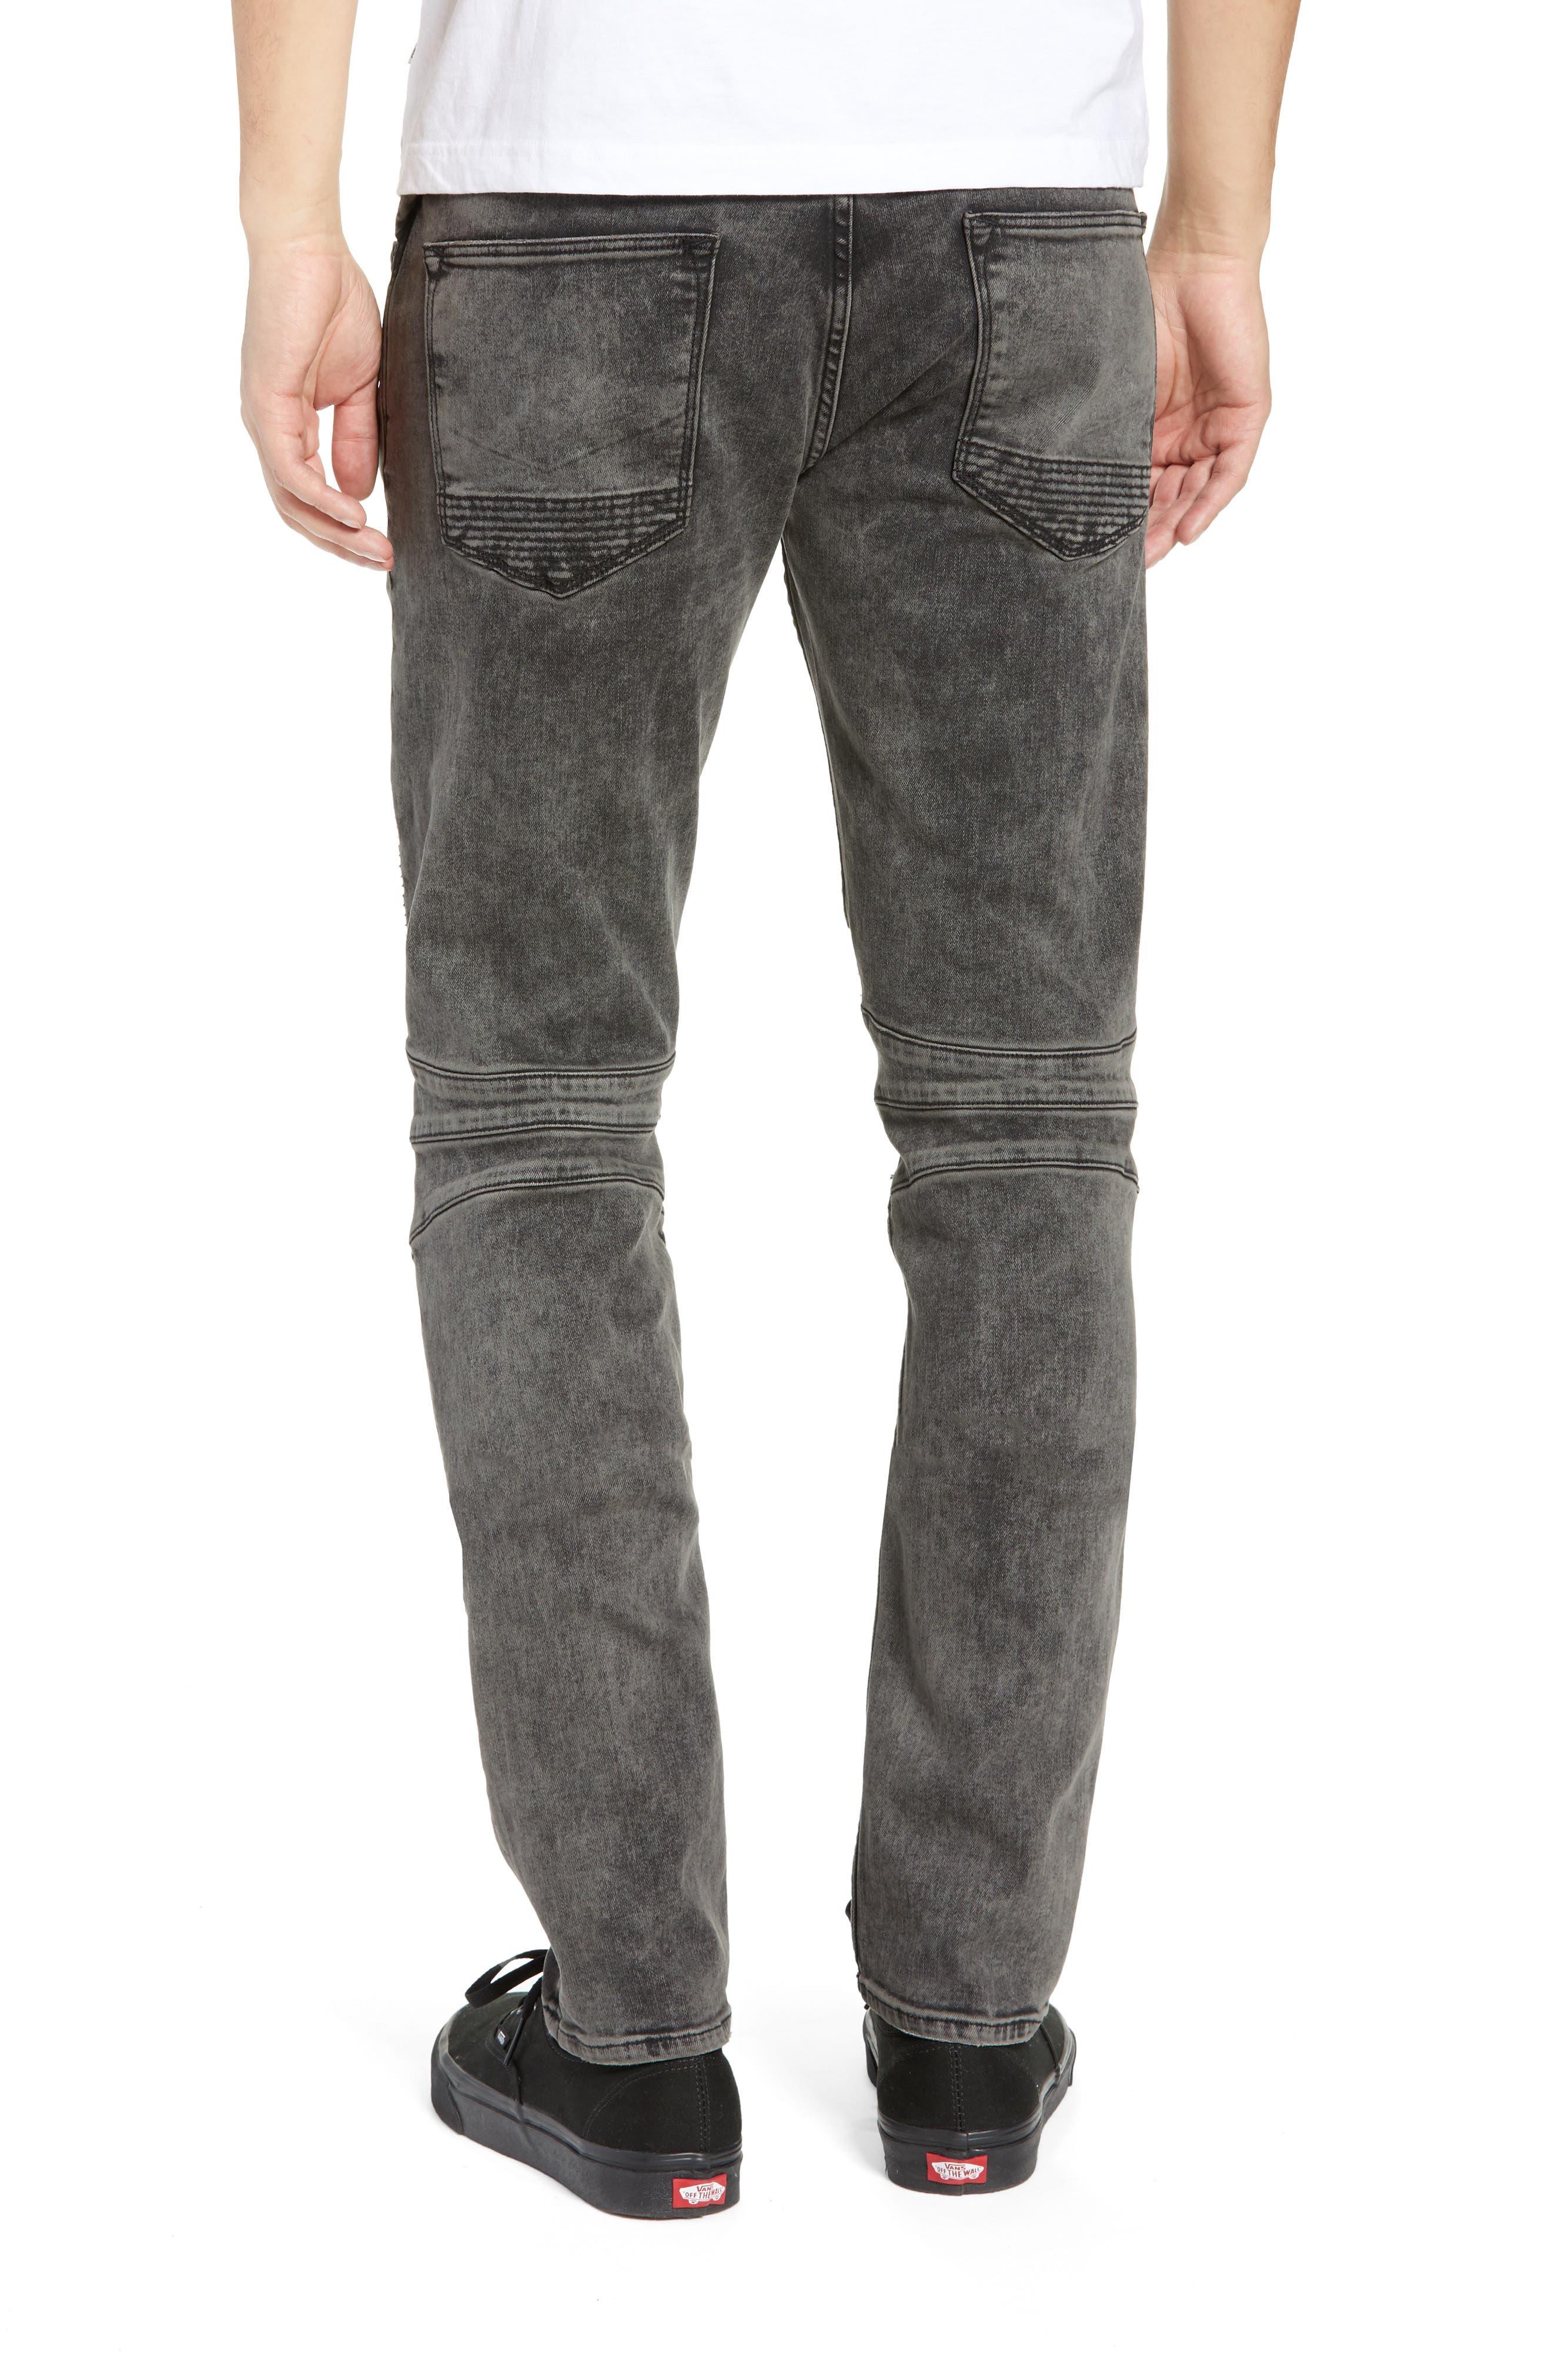 Blinder Biker Skinny Fit Jeans,                             Alternate thumbnail 2, color,                             FADE GRAPHITE